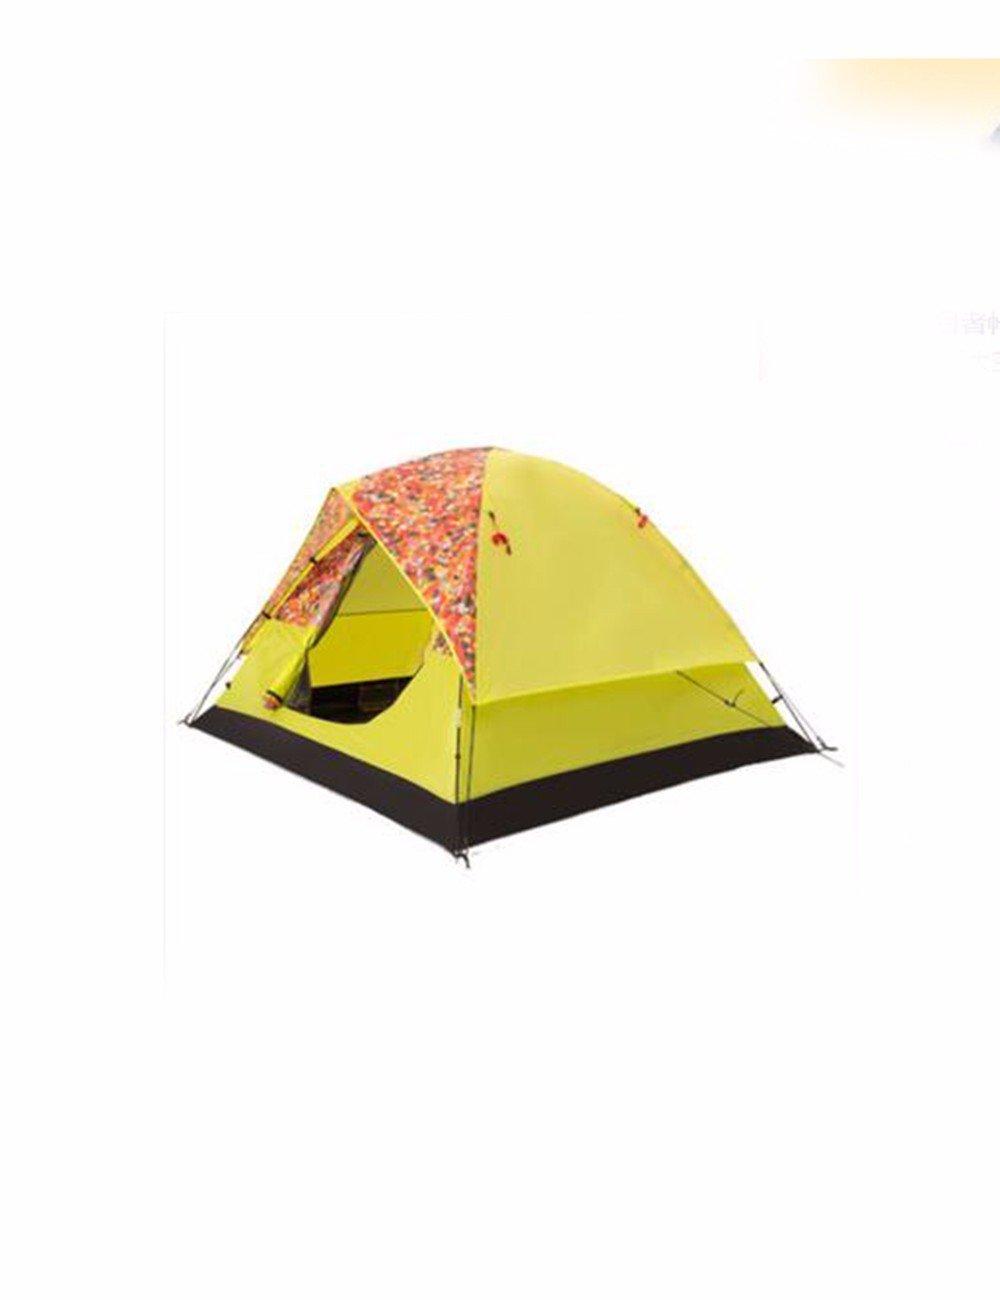 SJQKA-zelte, outdoor, 3 - 4 personen, winddicht, wasserdicht, sonnencreme, camping, camping, familienausflüge, zelte,b